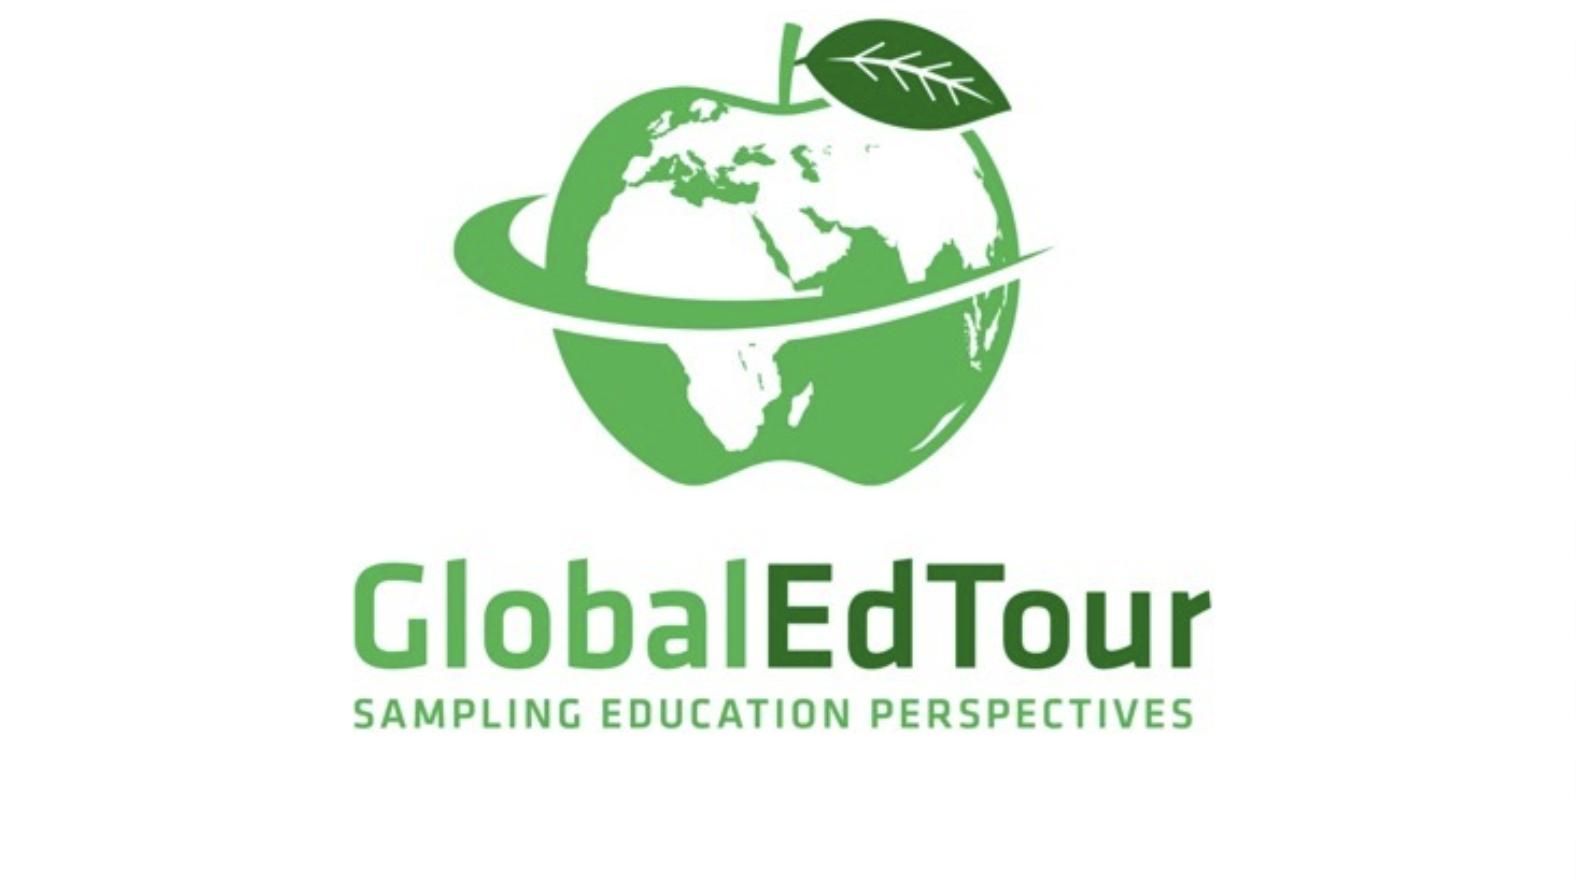 GlobalEdTour